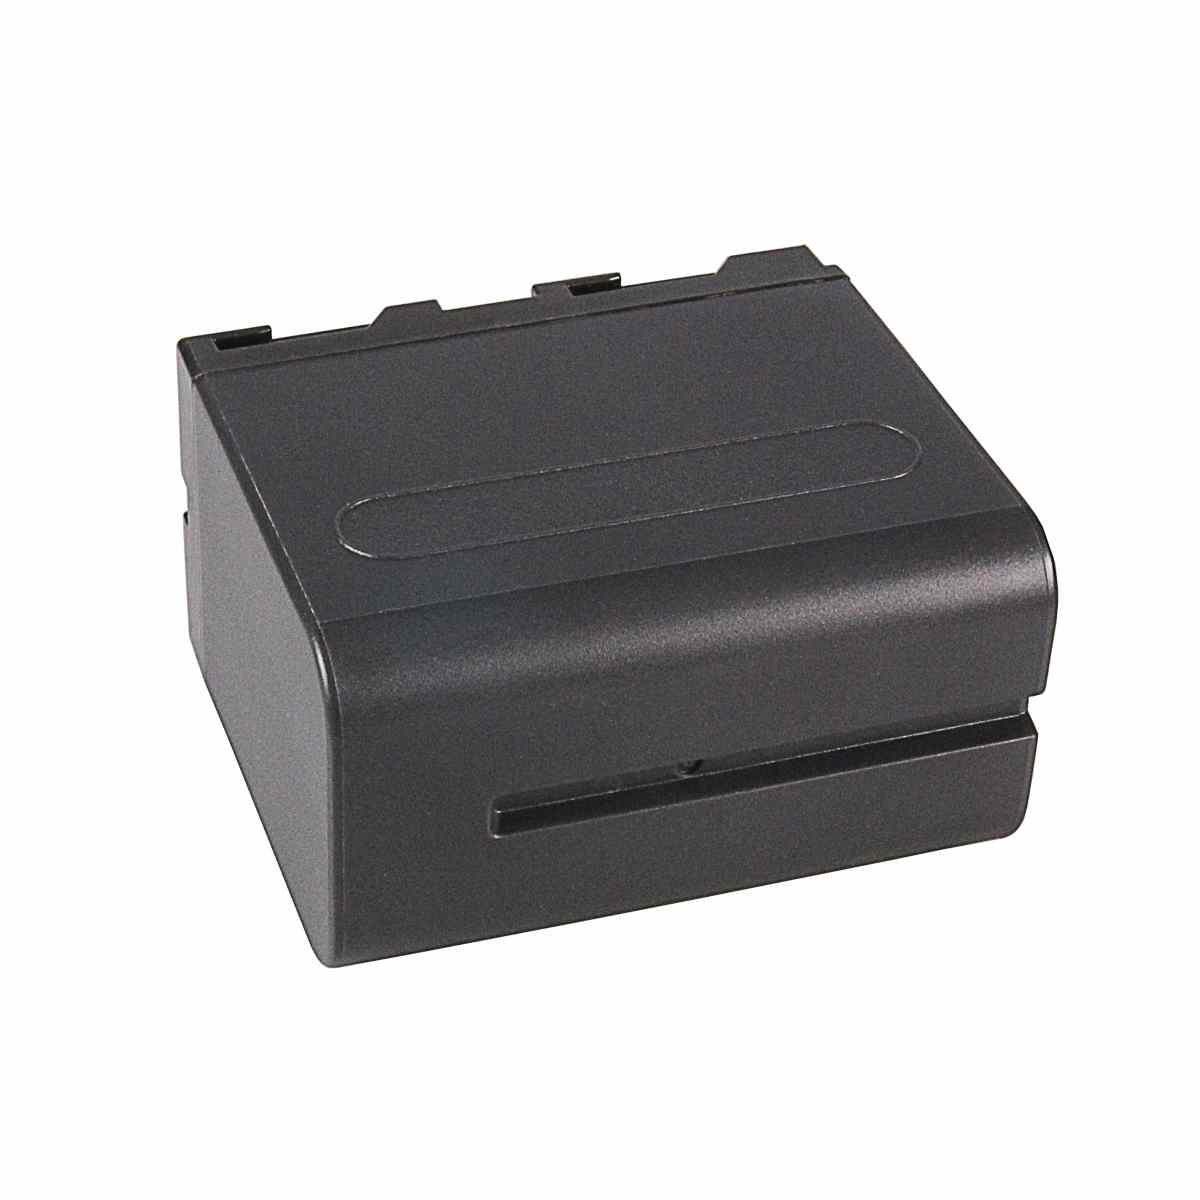 NP-F960 Li-Ion Battery for Sony, 6600mAh